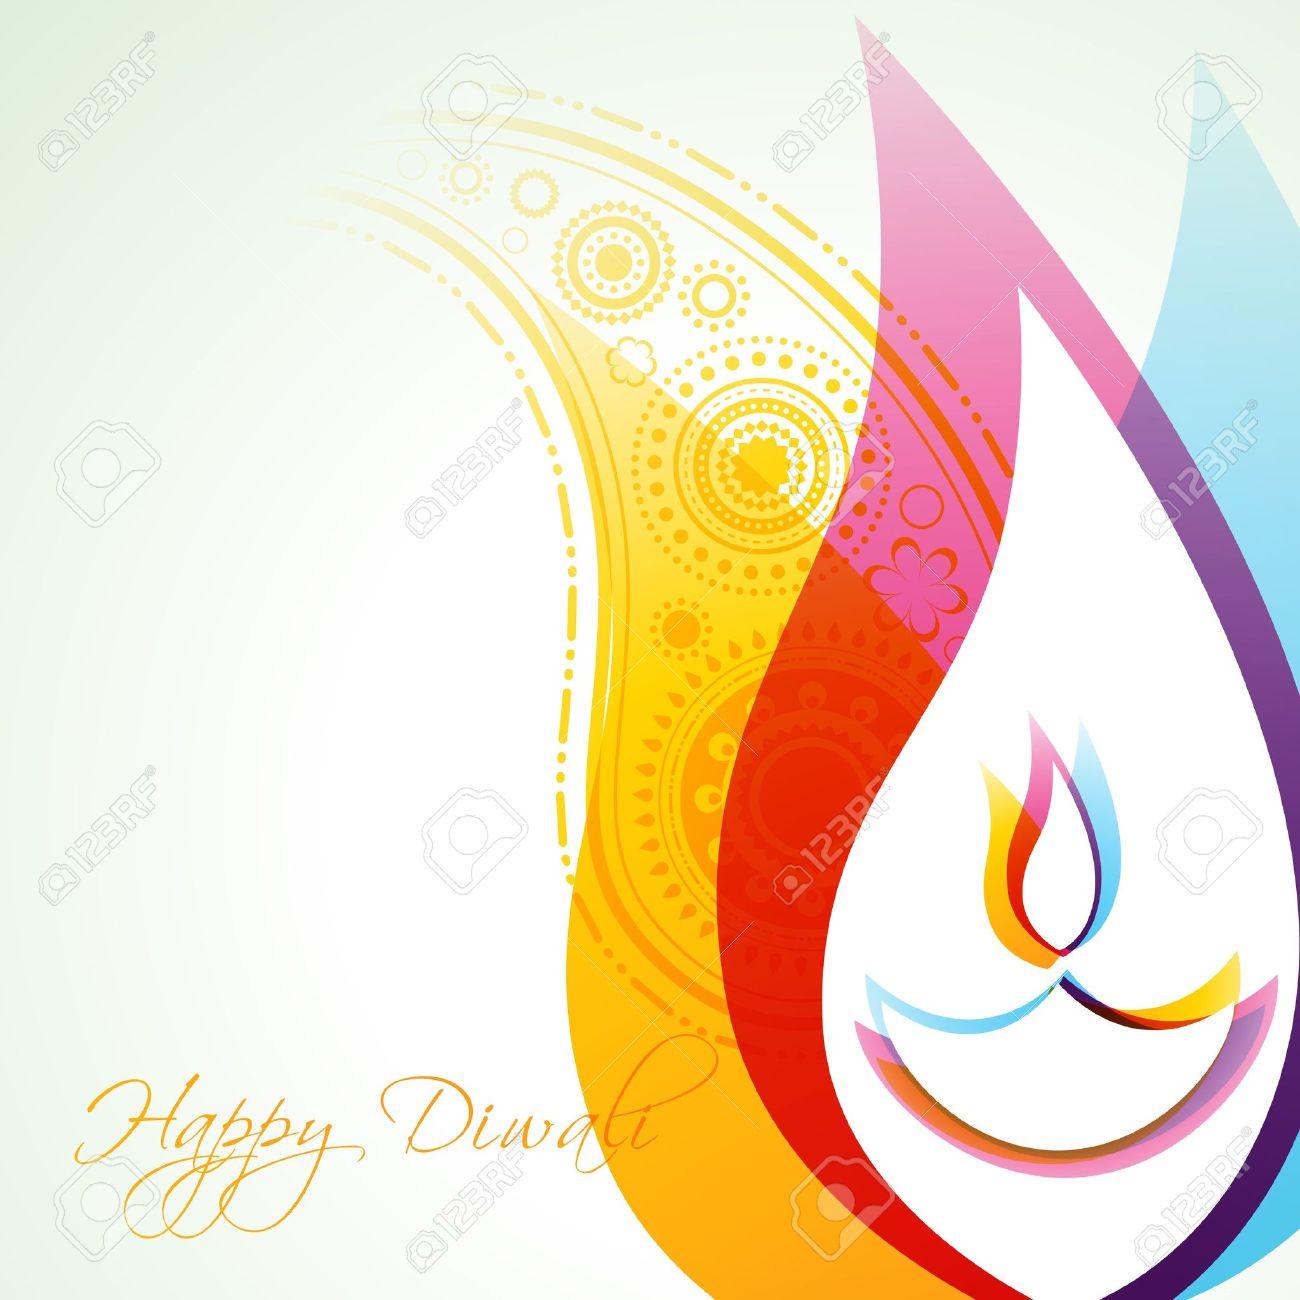 Diwali Clip Art Images | Clipart Panda - Free Clipart Images